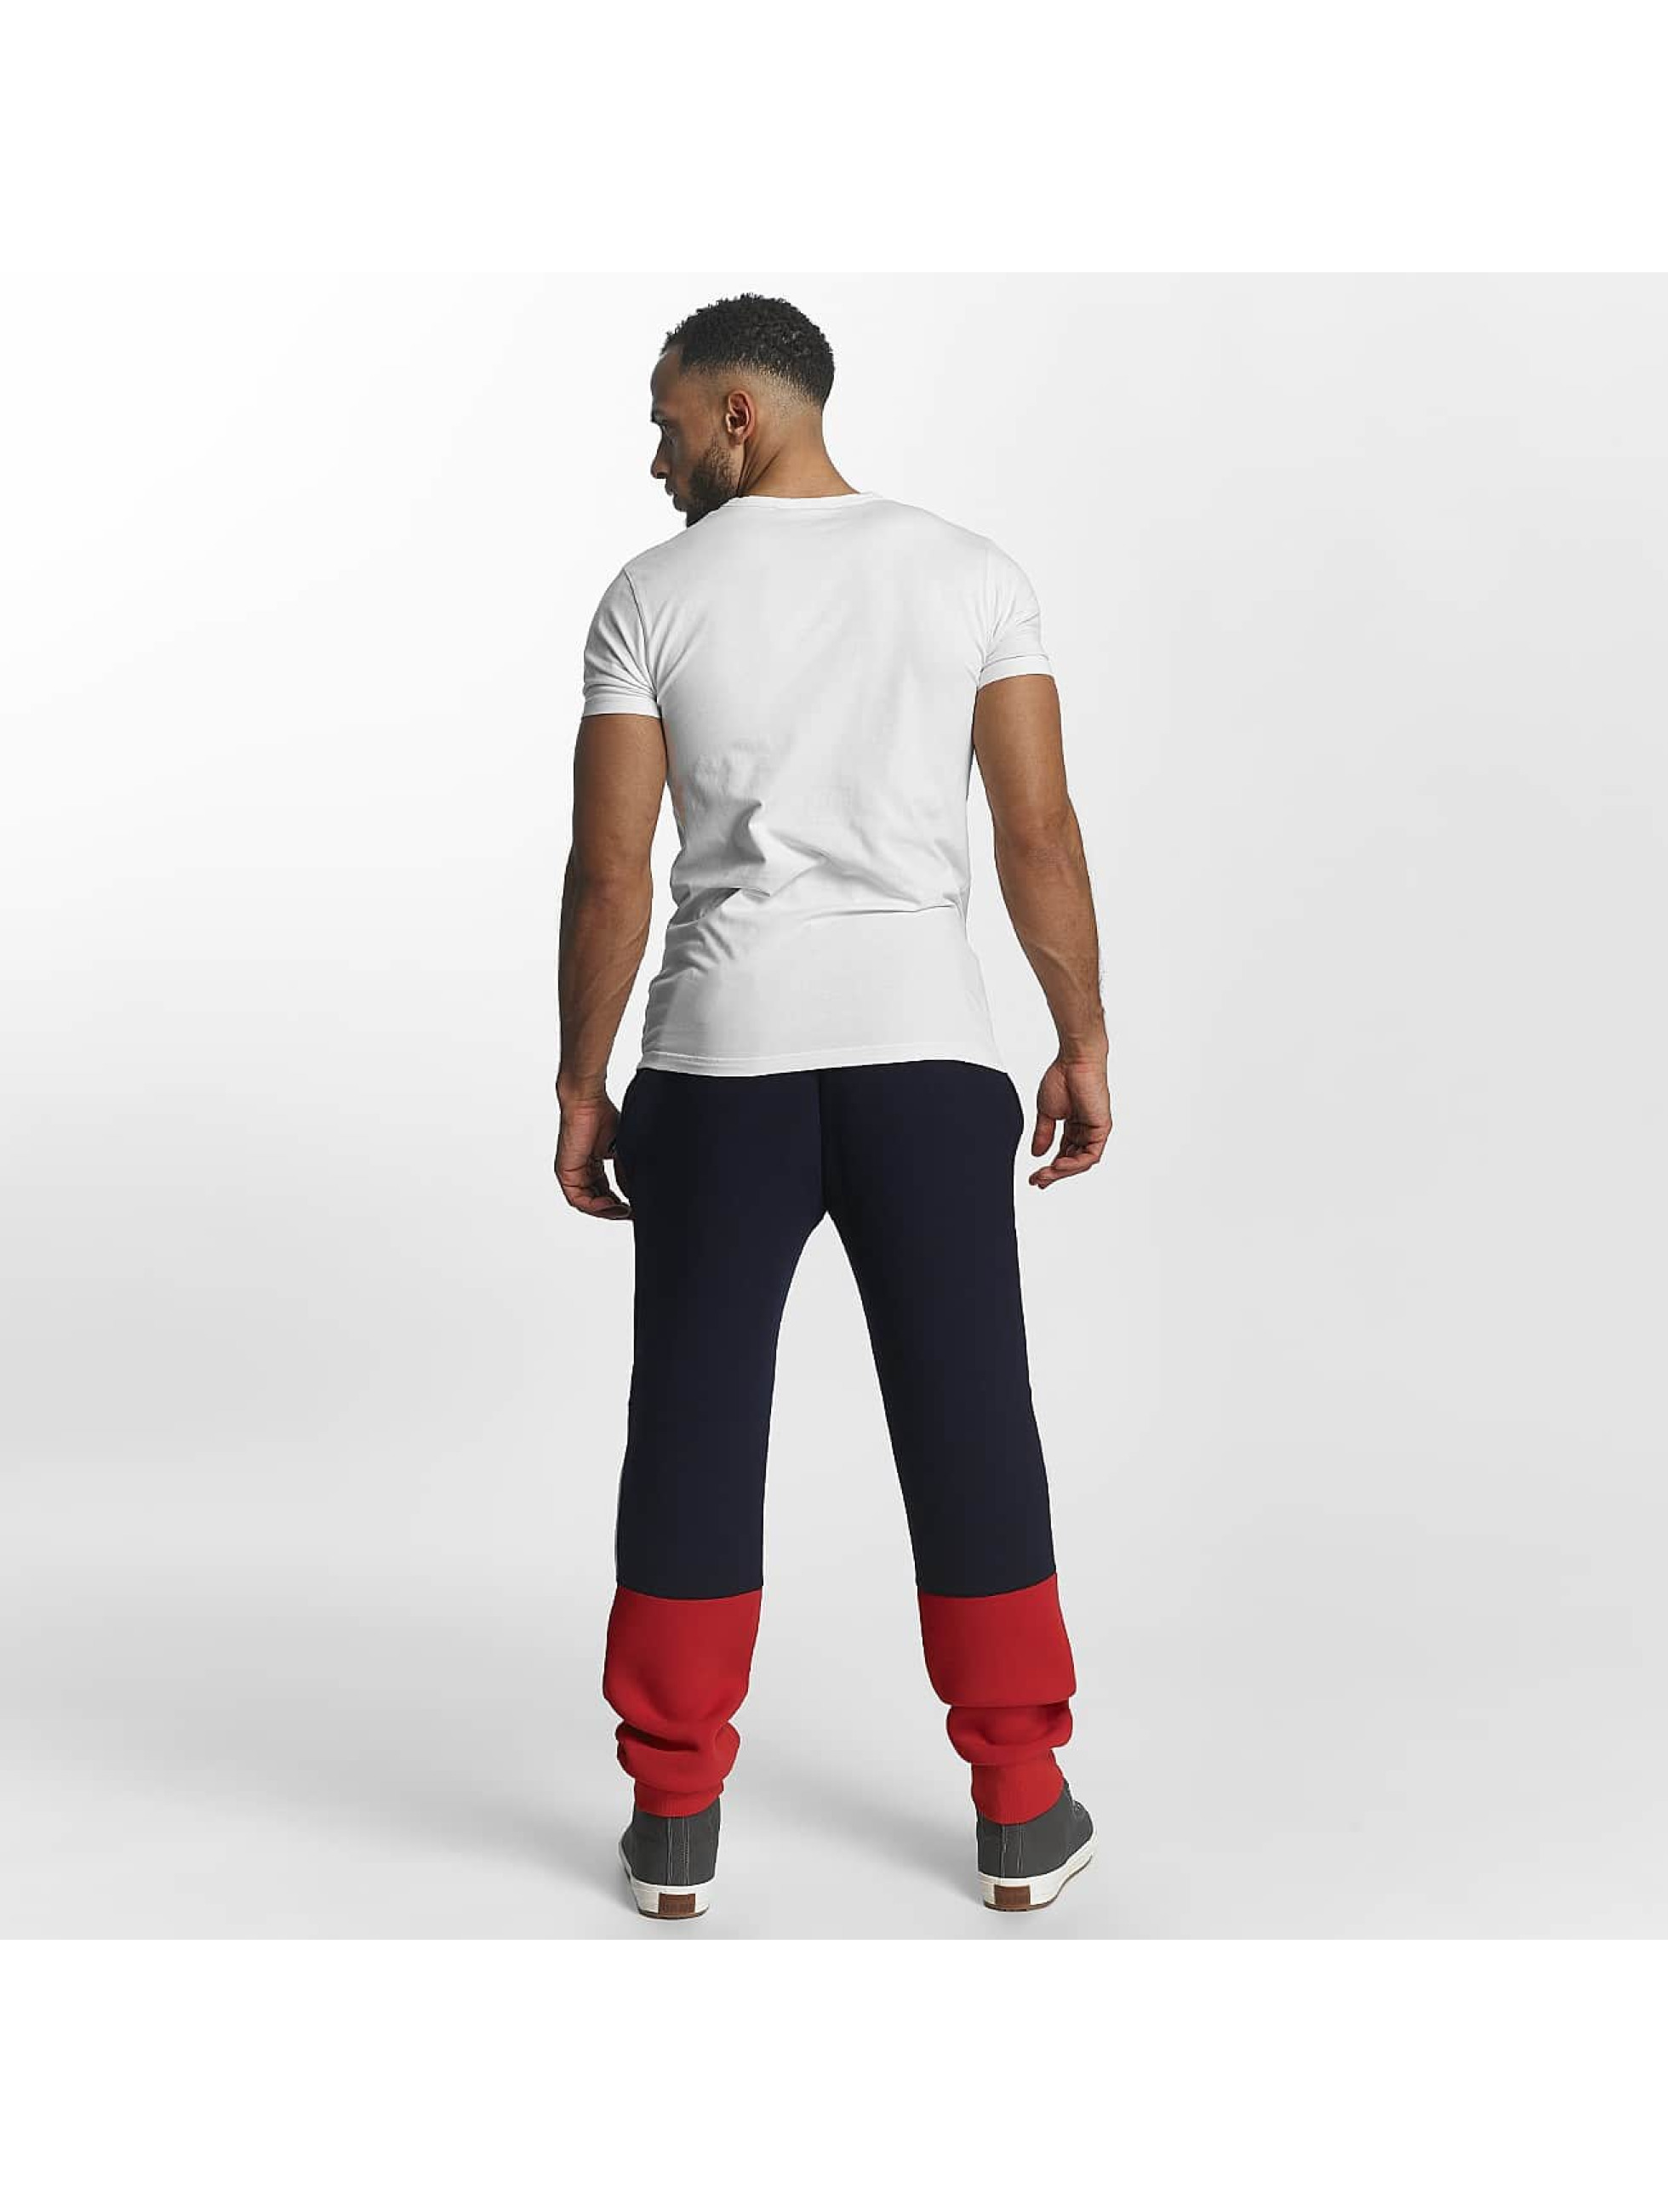 FILA Spodnie do joggingu Black Line Jude niebieski